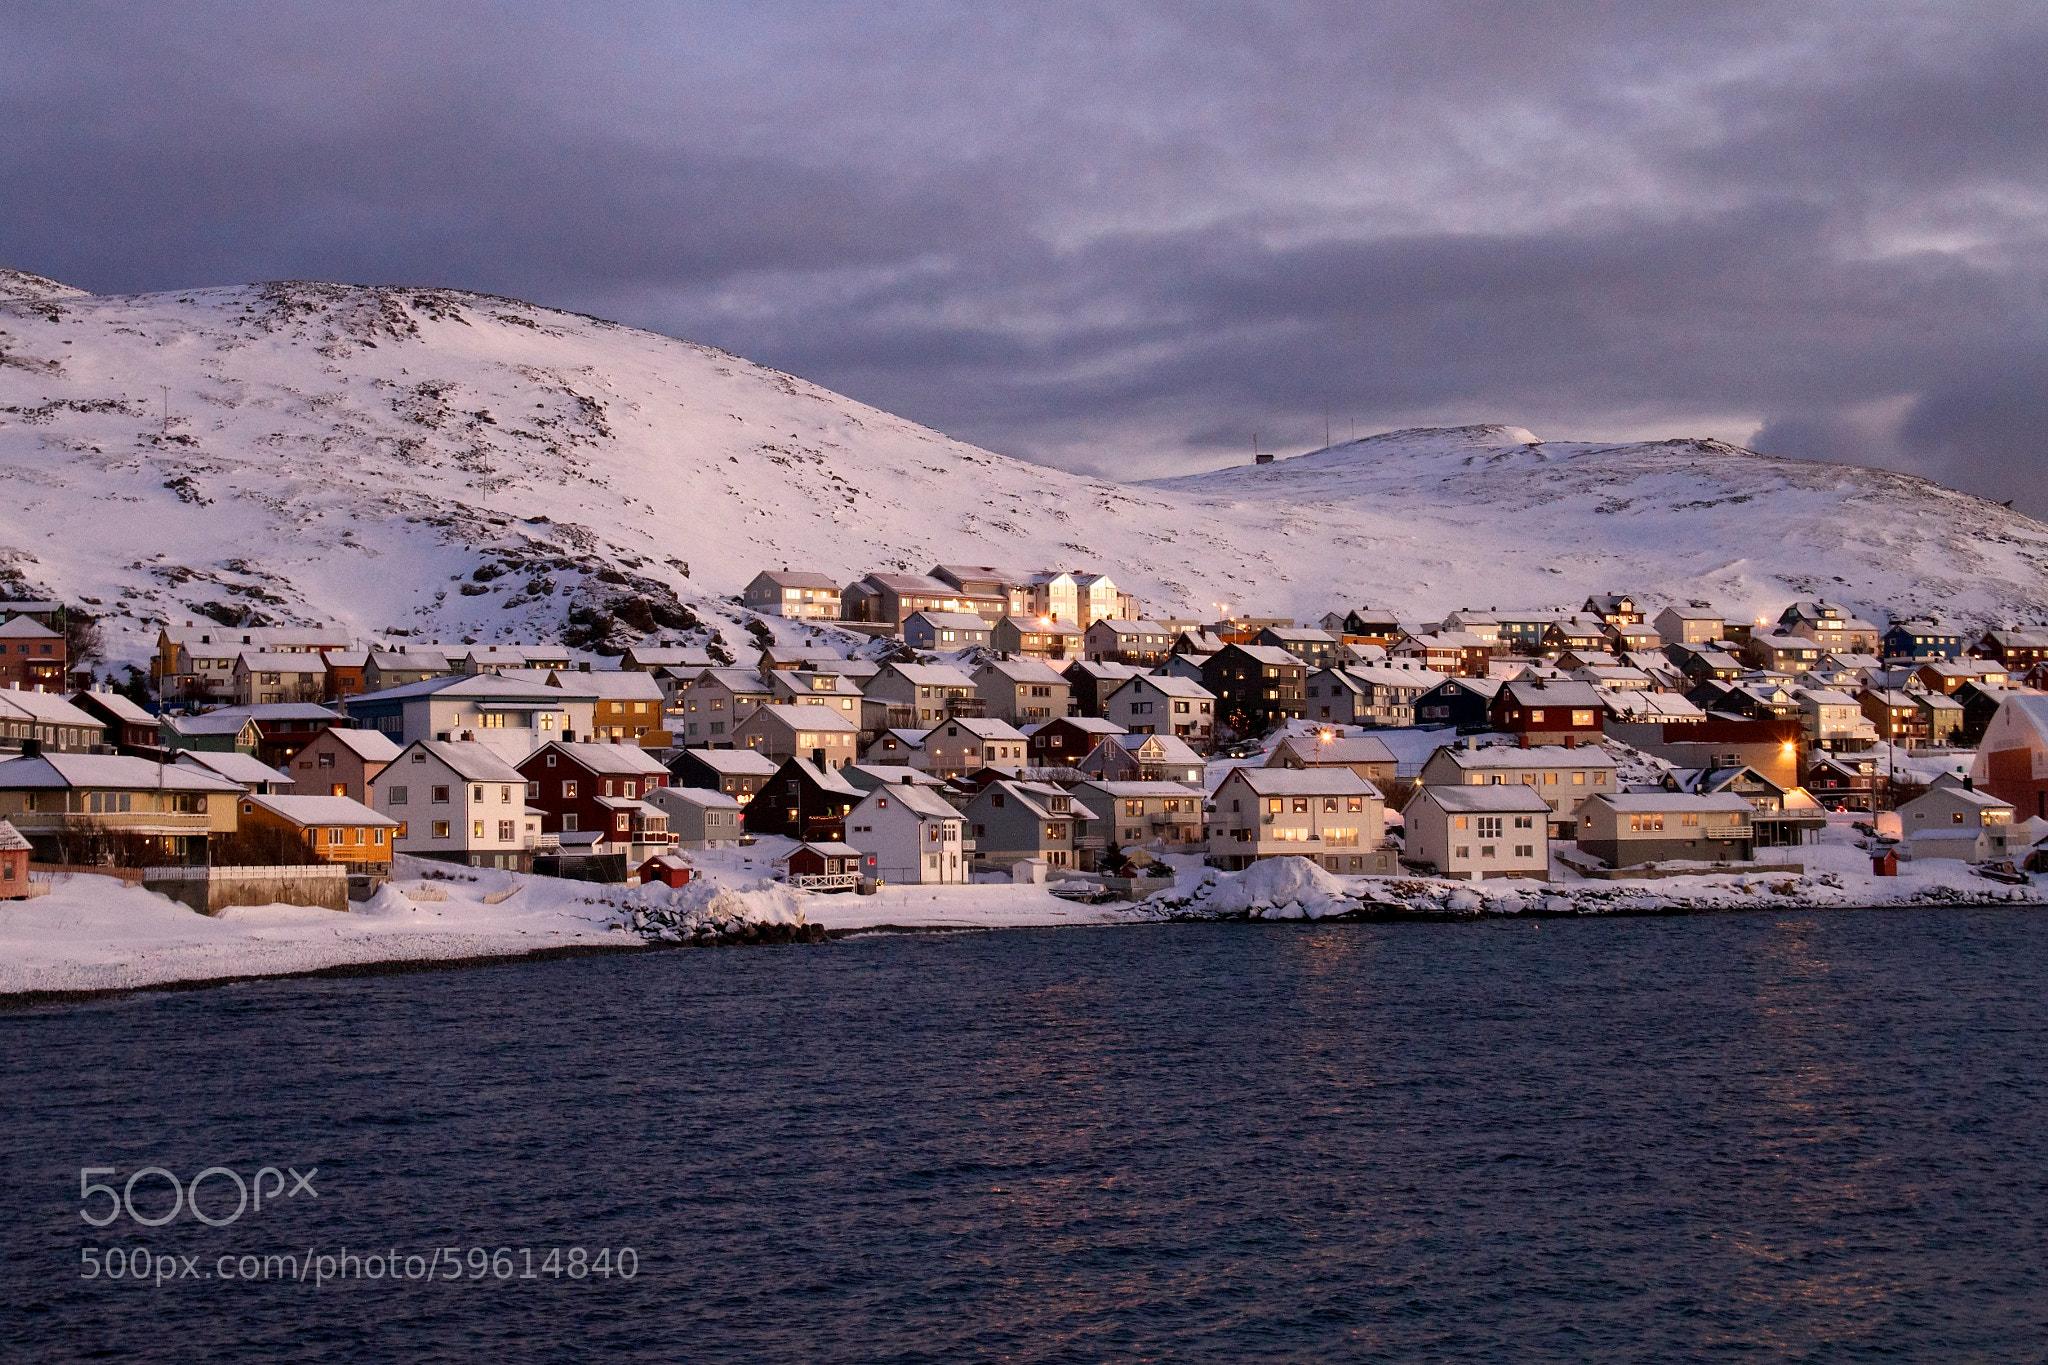 Snowy Honningsvag